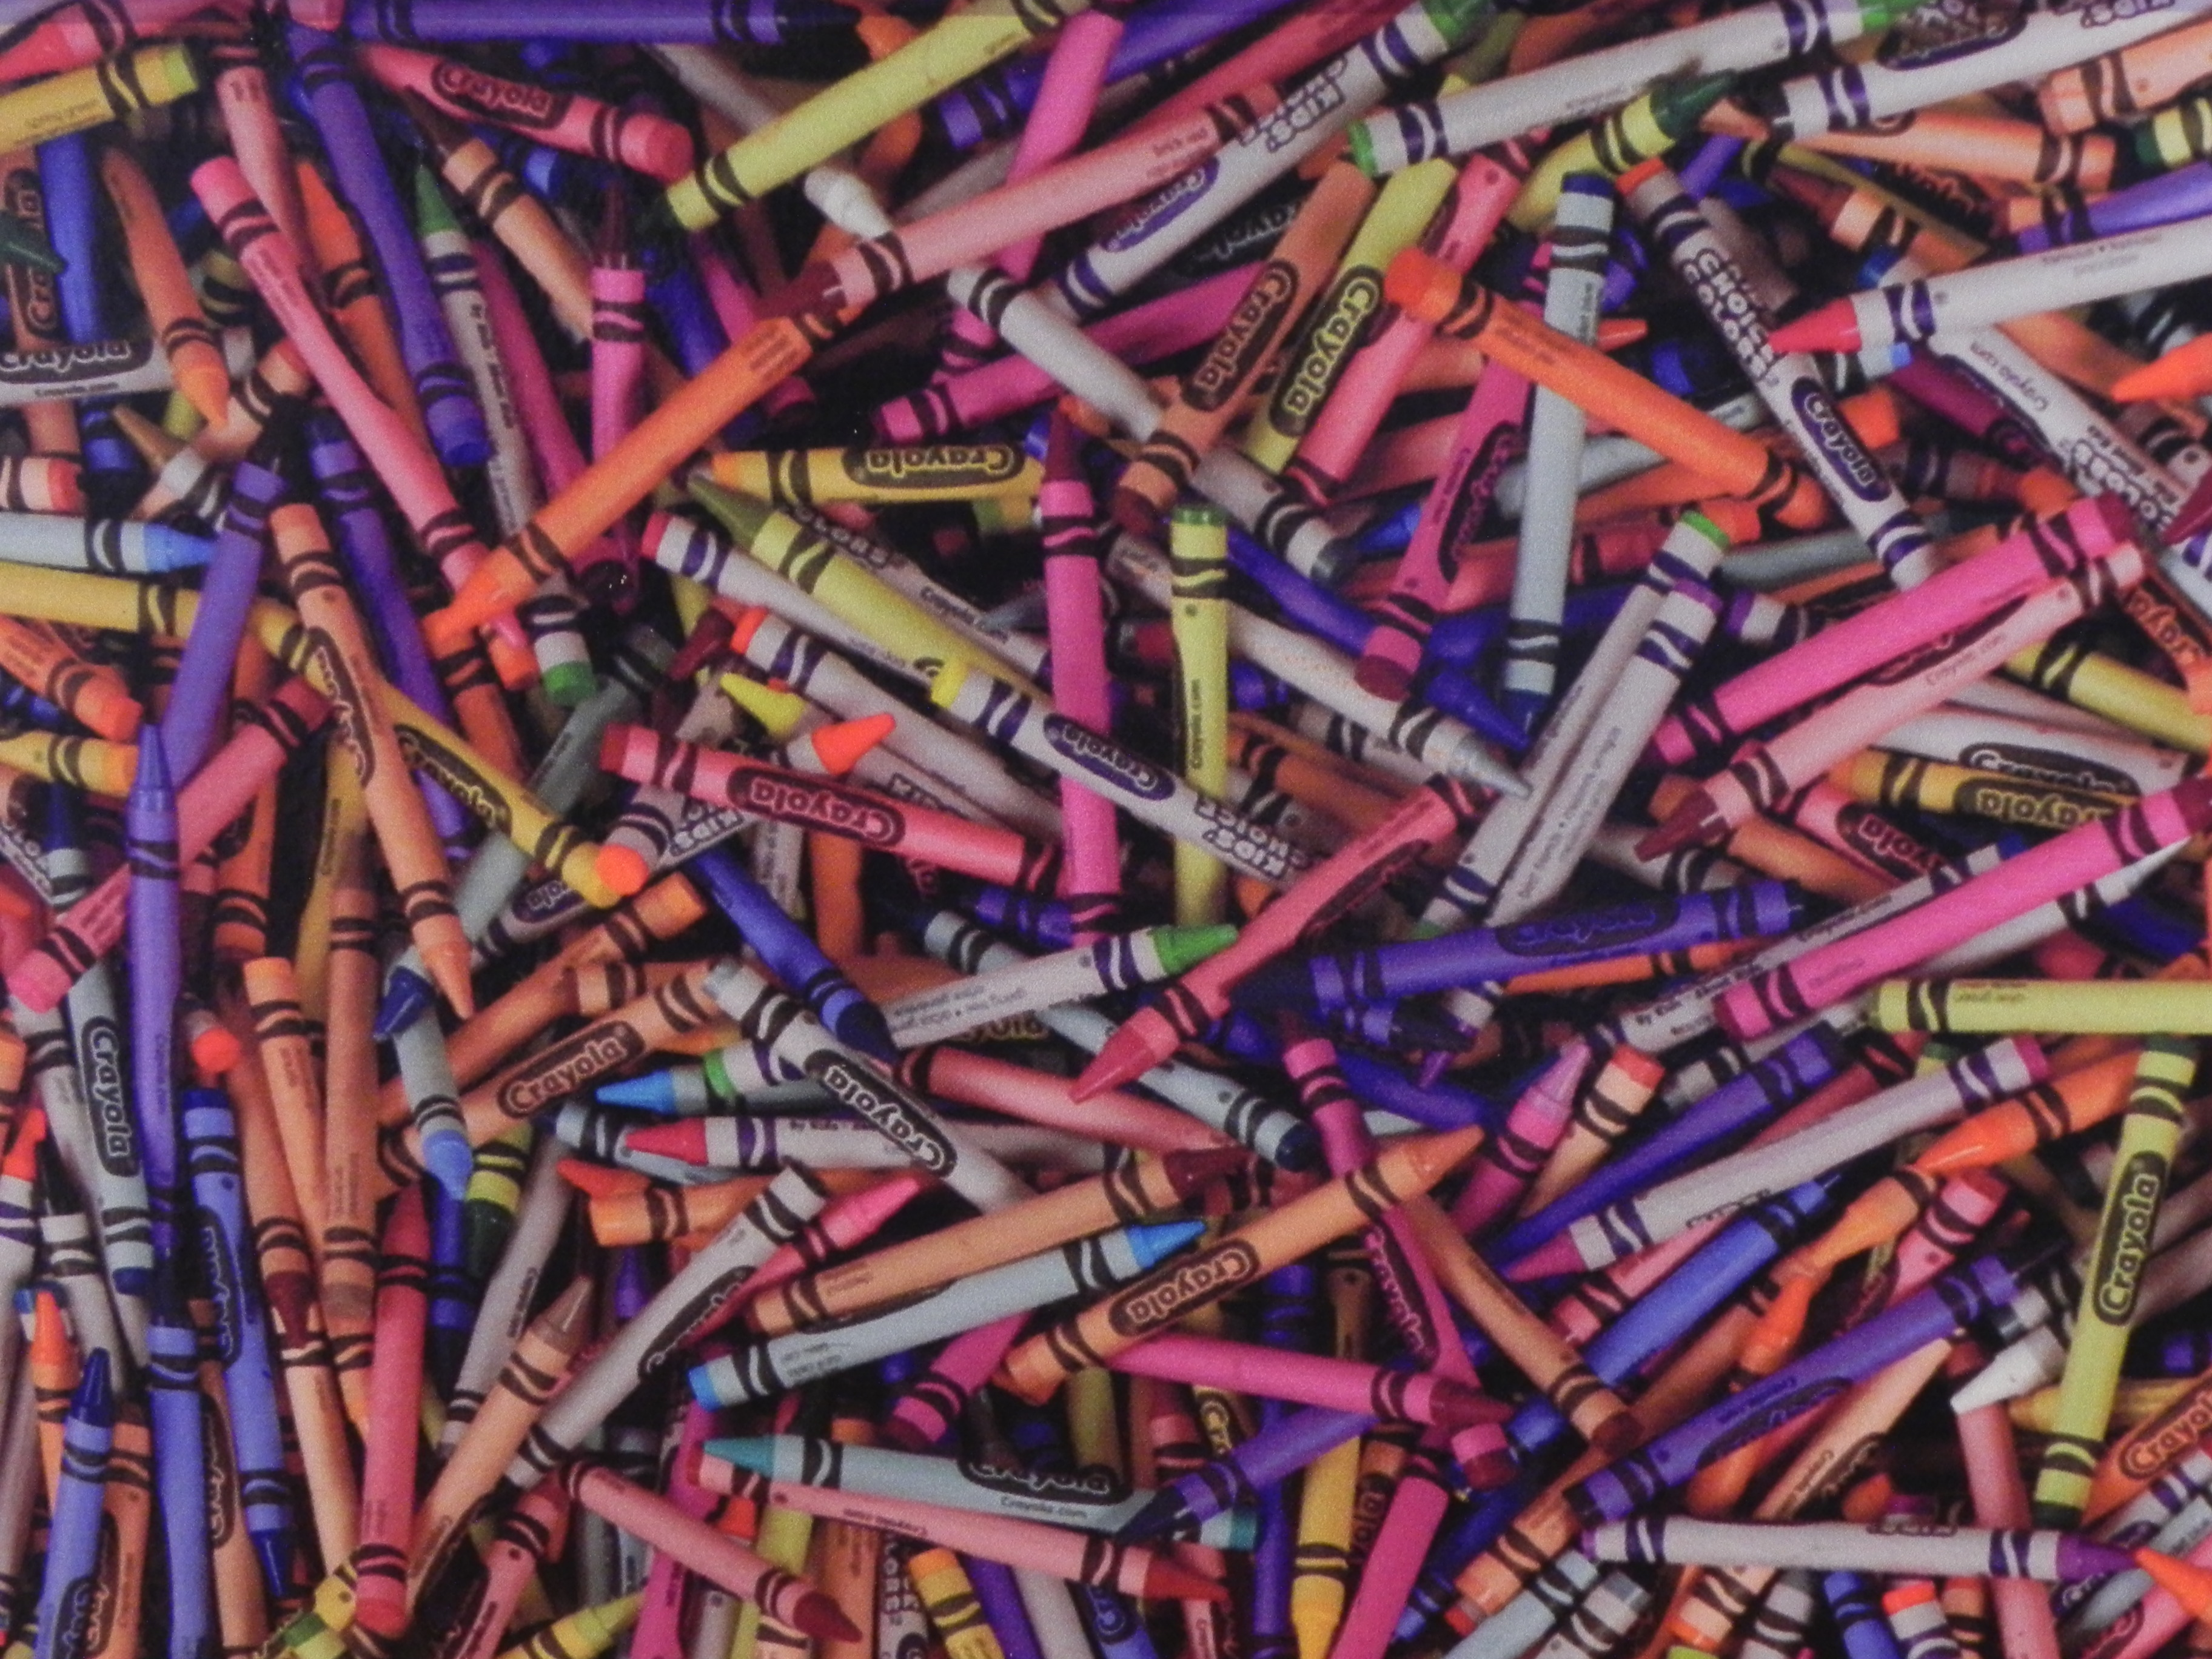 crayola experience steve a wiggins